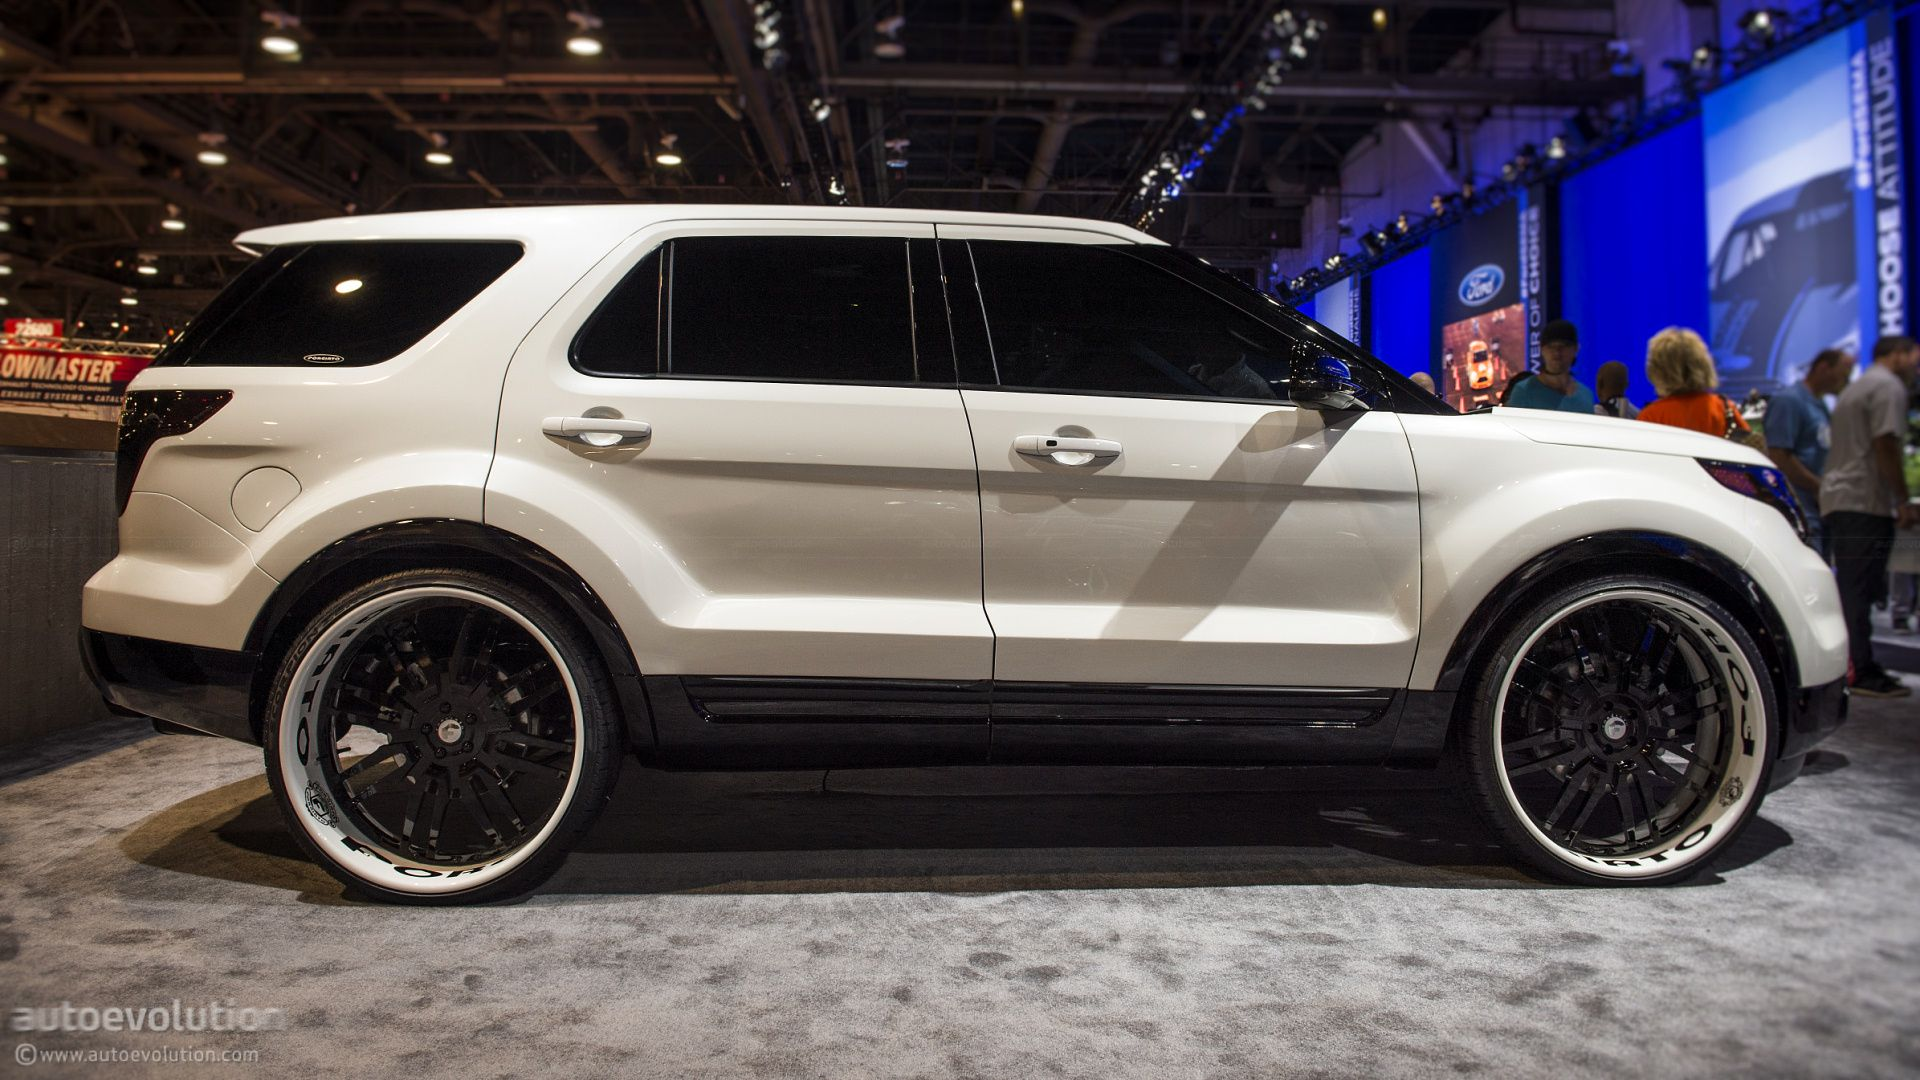 Ford Explorer Sport 2014 White Febcdcfecadddefbdb